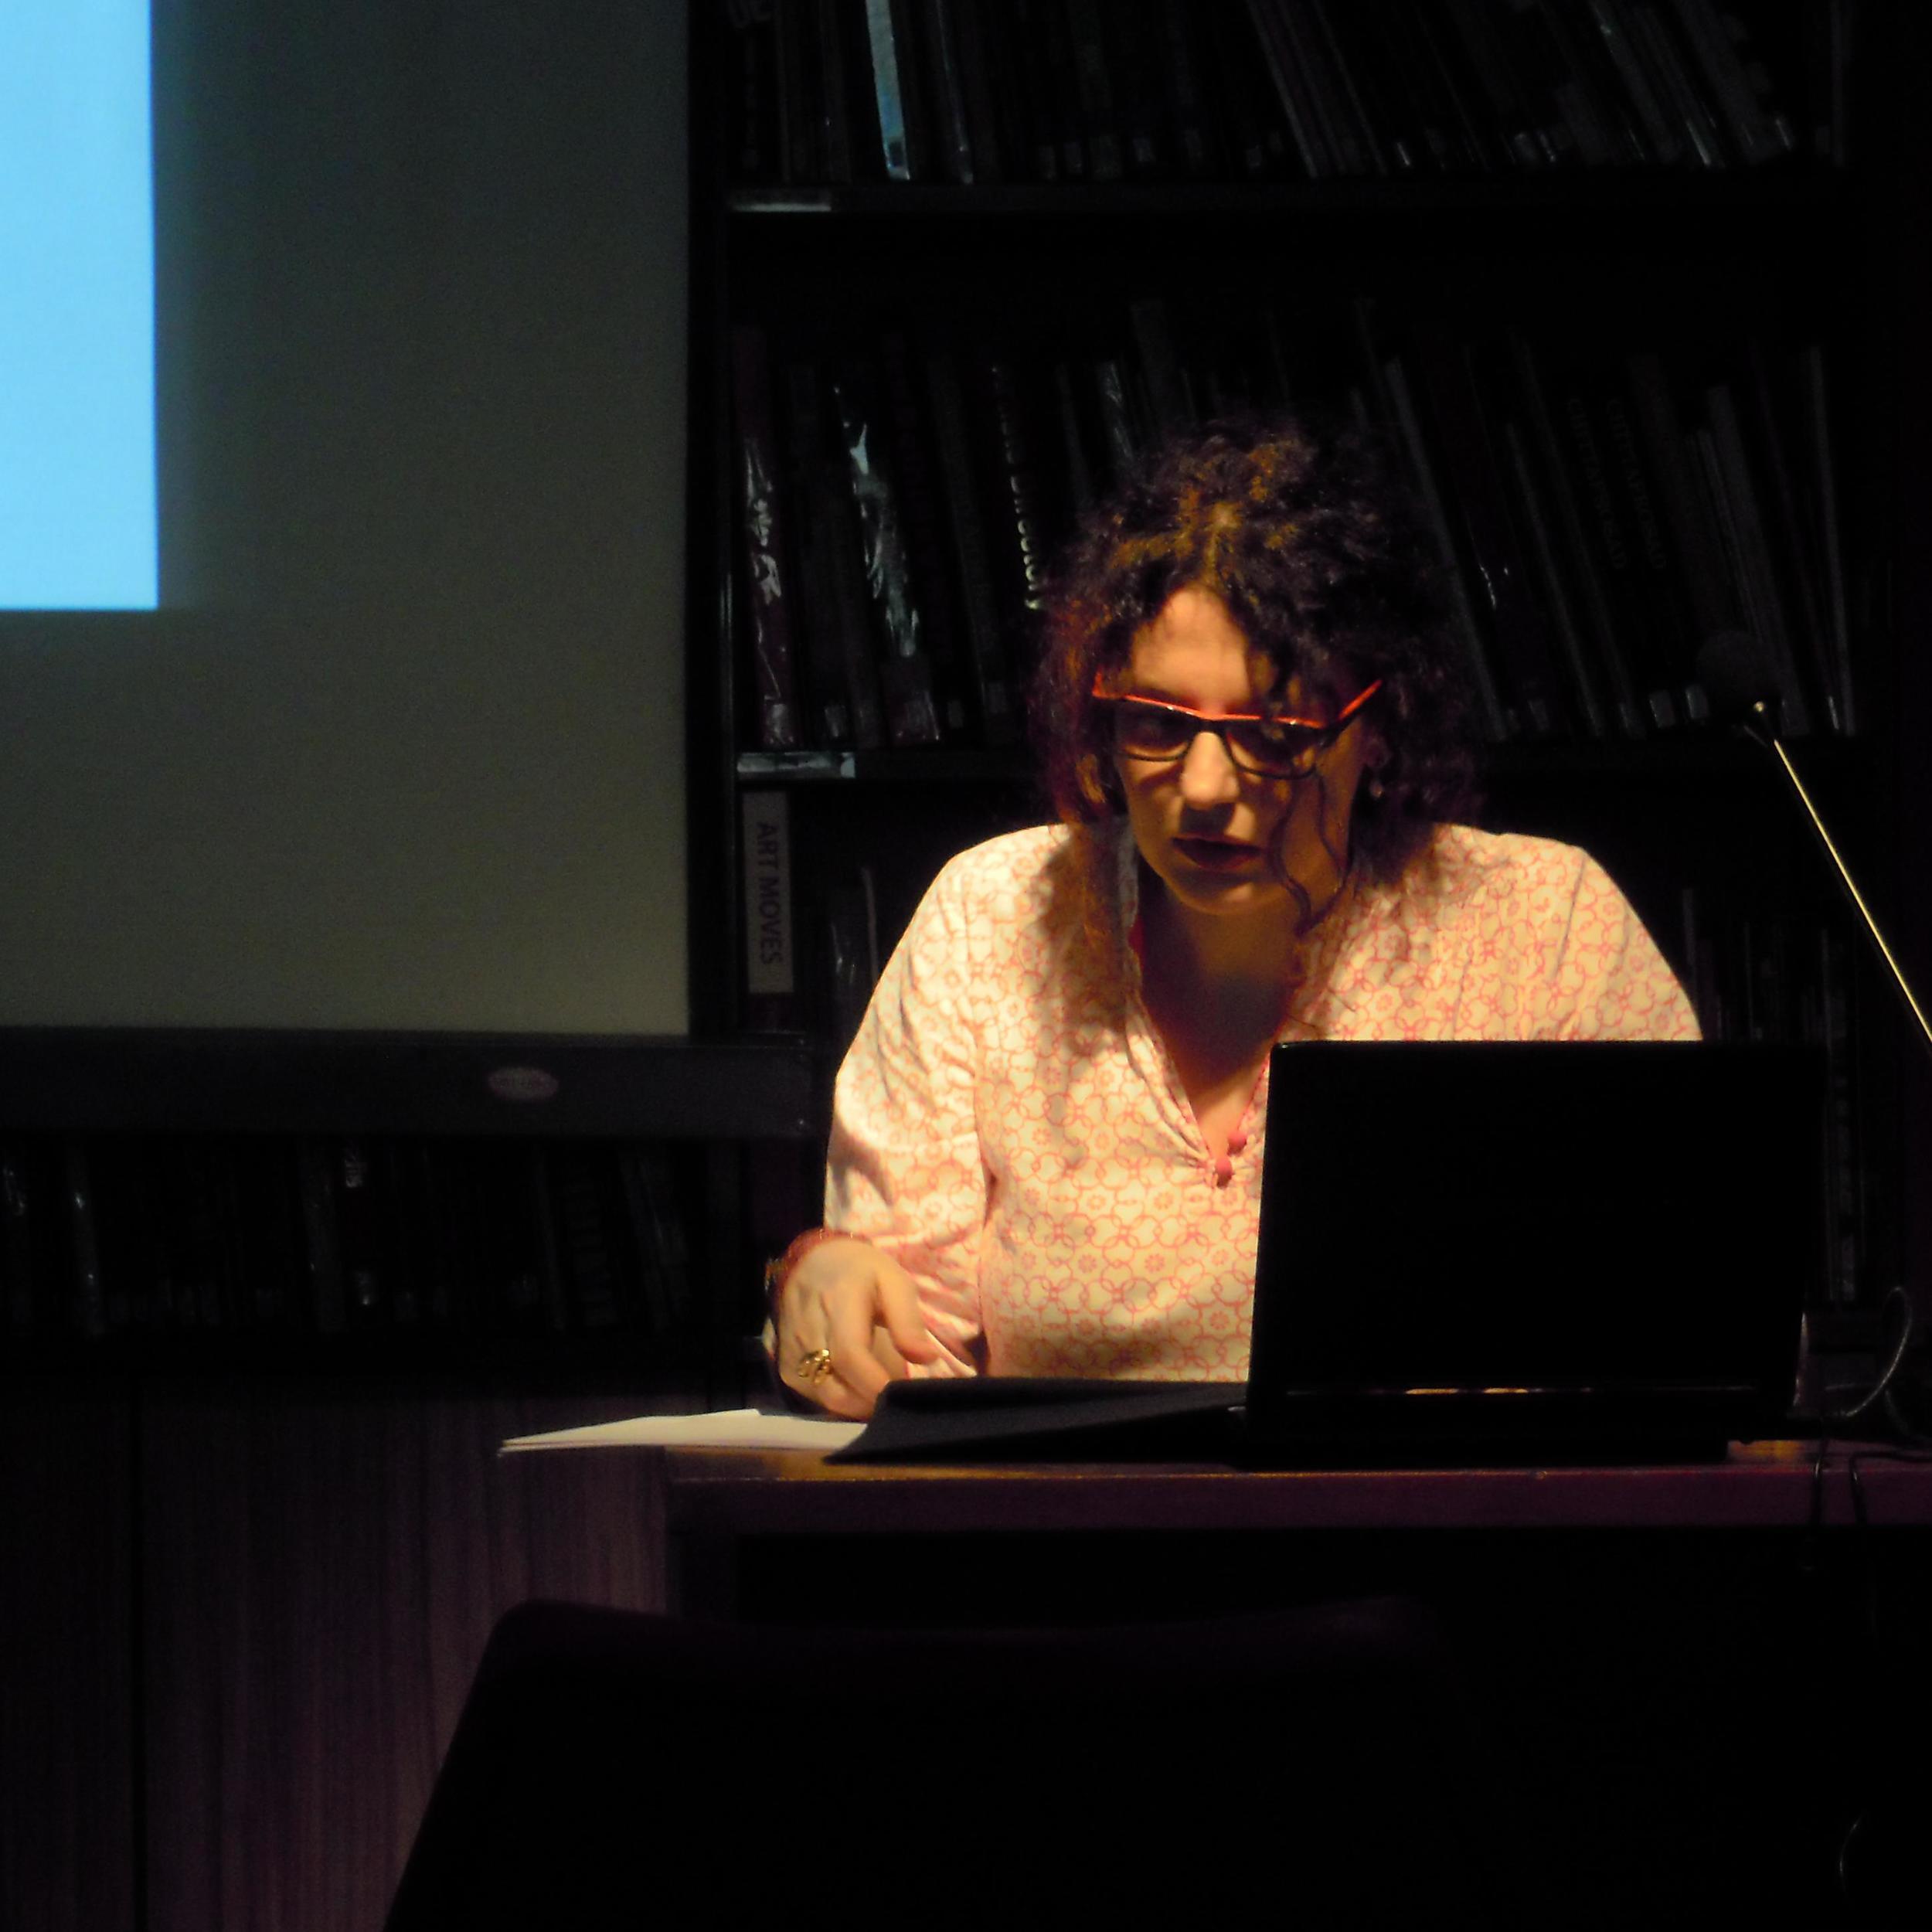 Normal    0                false    false    false       EN-IN    X-NONE    X-NONE                                                                                        Untold Histories: India at the Venice Biennale since 1954 | A talk by Manuela Ciotti